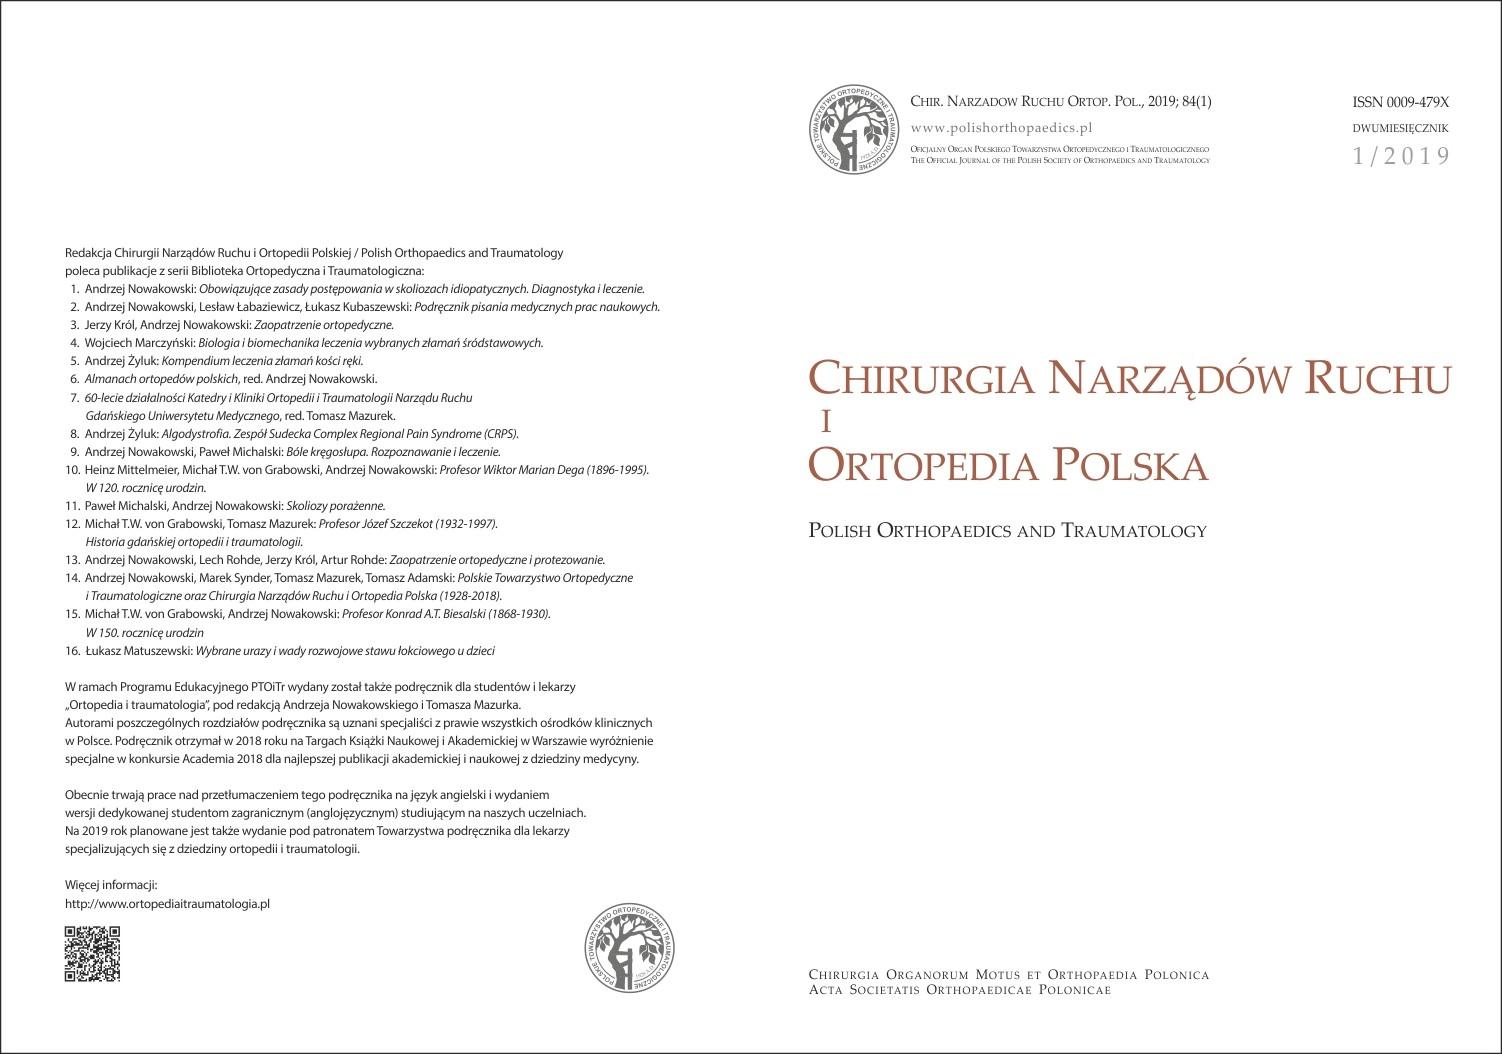 orto-cover-new_2019-1_druk_6-03-2019